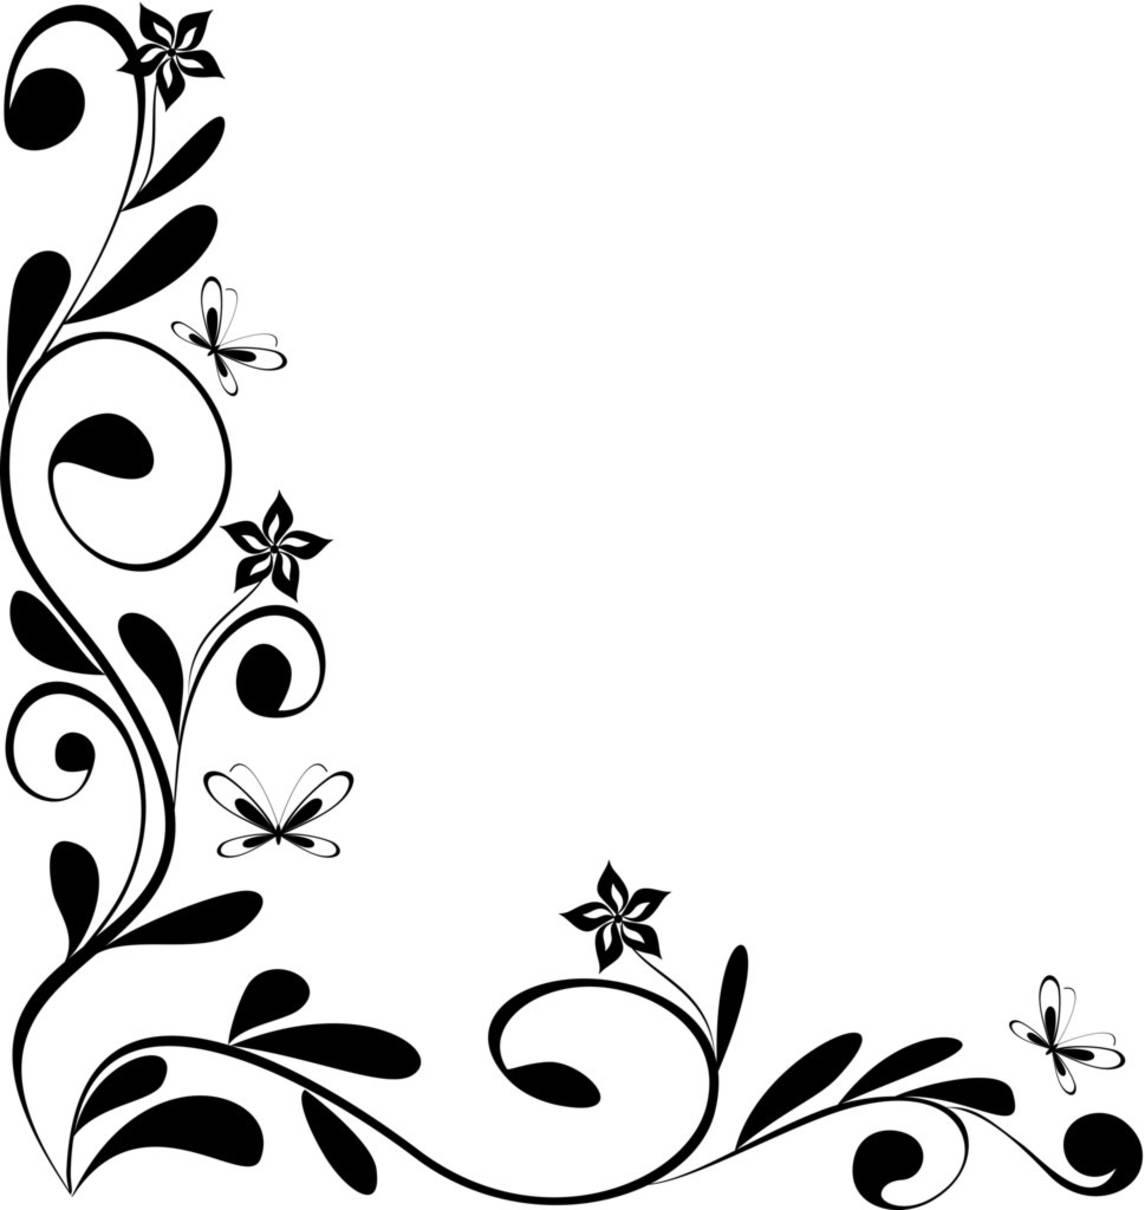 Black and White Floral Border Design